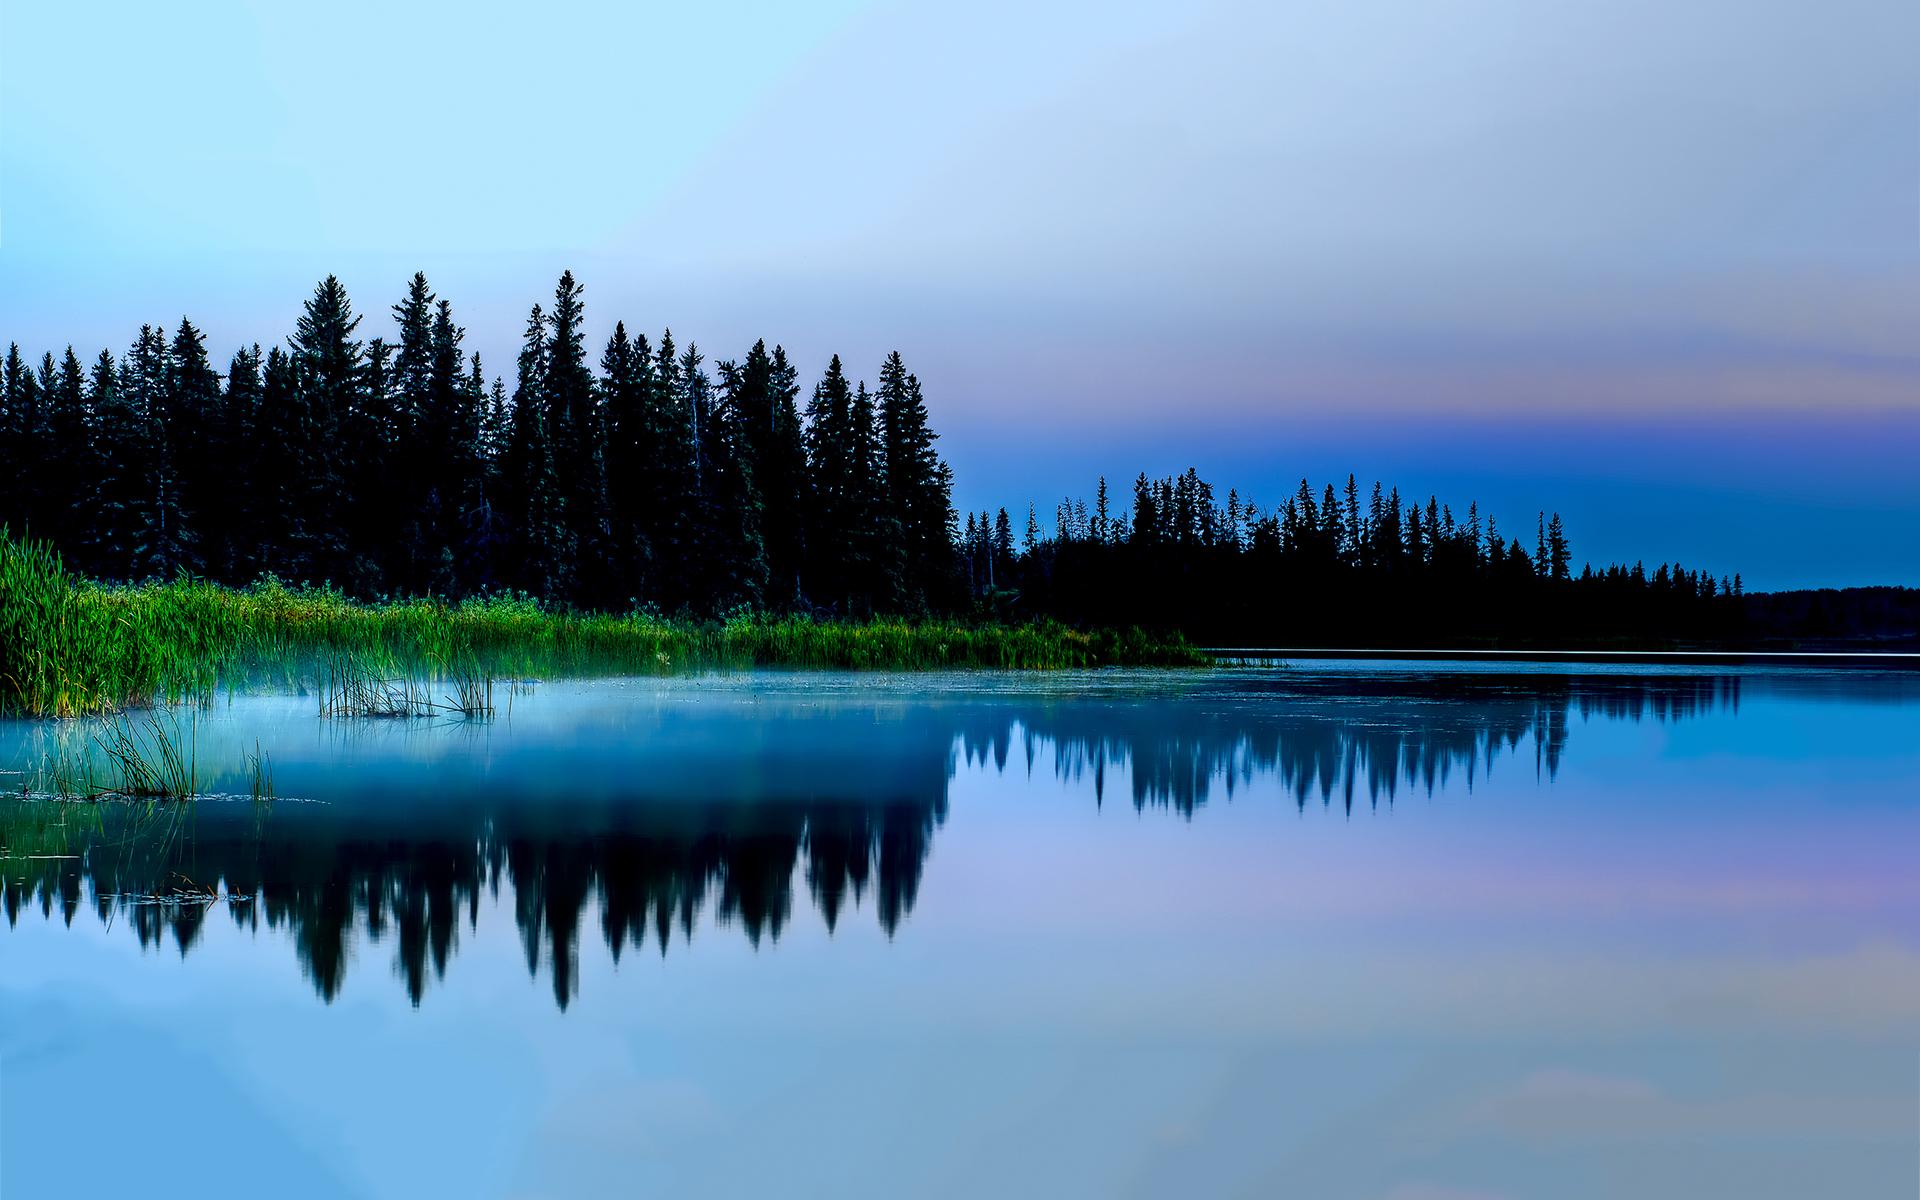 Silent lake evening